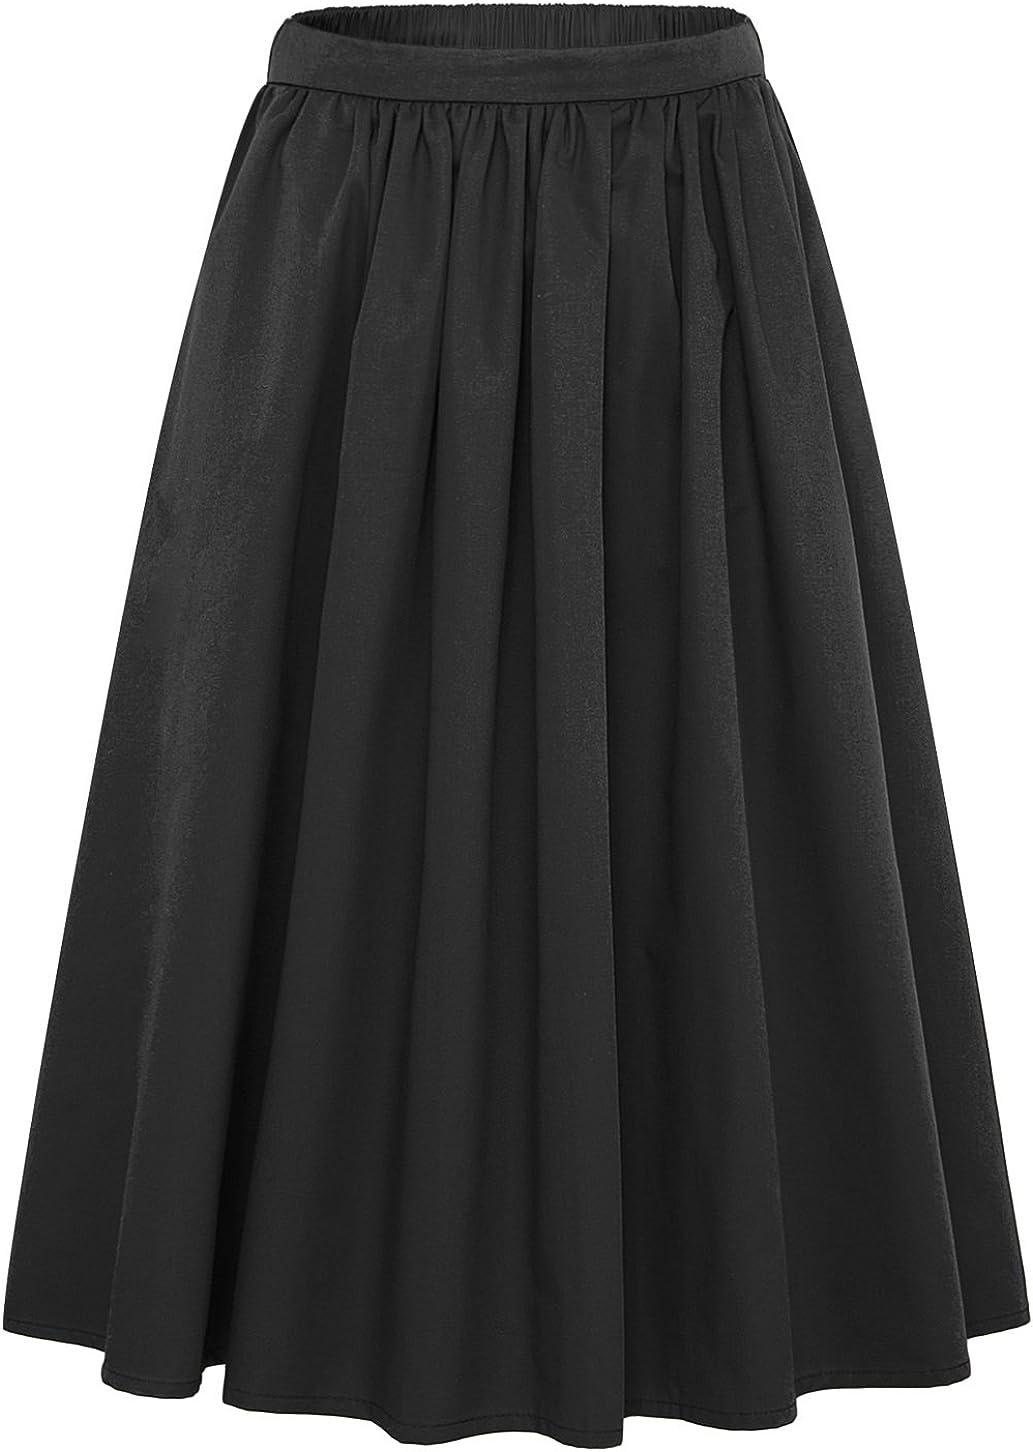 chouyatou Women's Simple Back Elastic Waist A-Line Flared Midi Skirts-Pocket